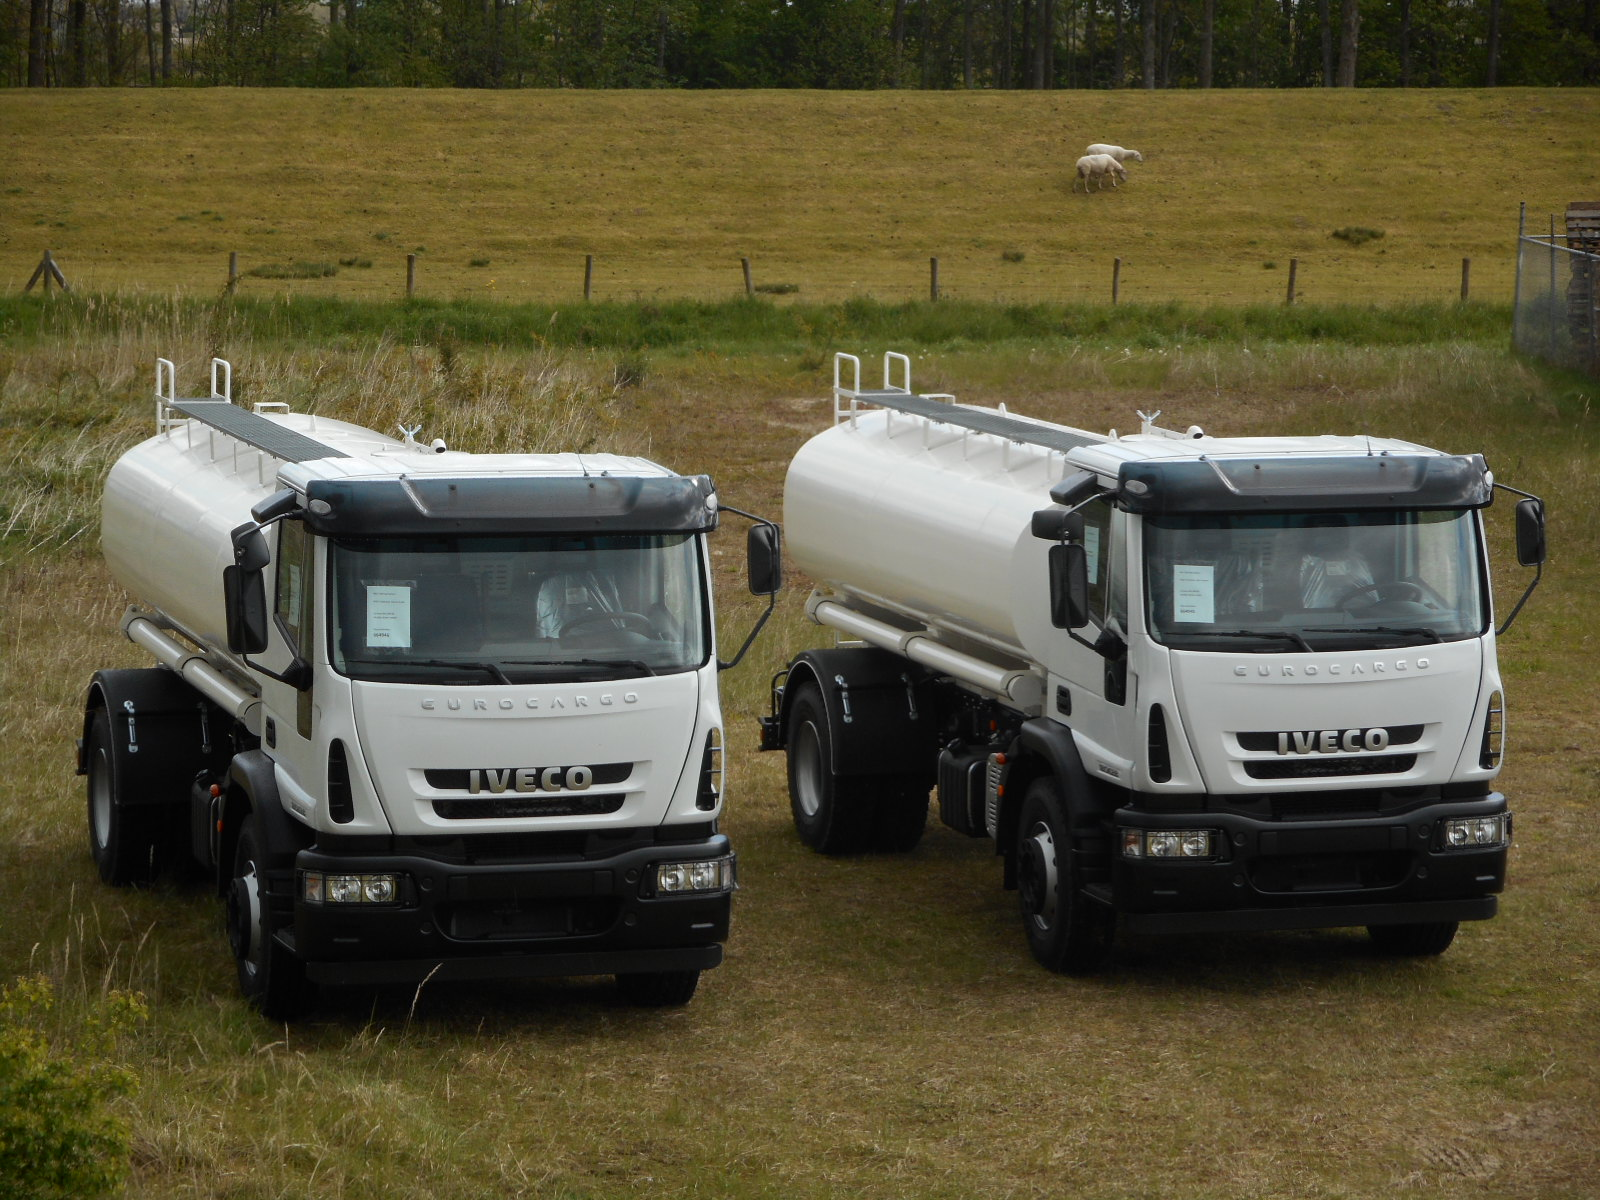 Iveco tank trucks